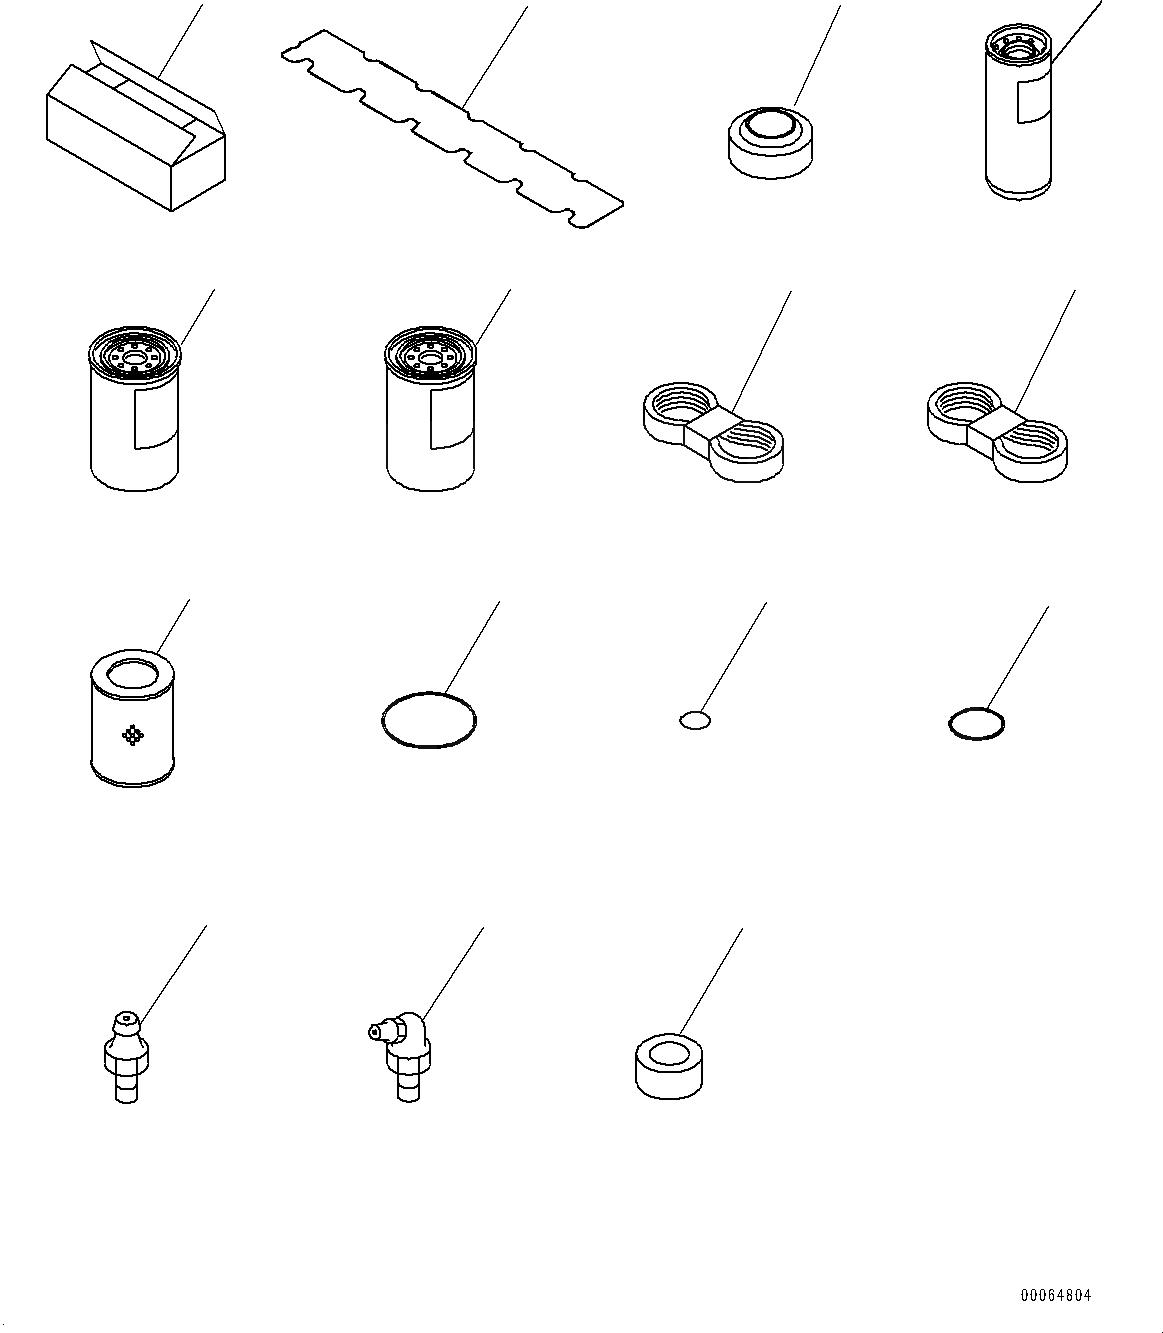 207-60-71183 Komatsu ФИЛЬТР